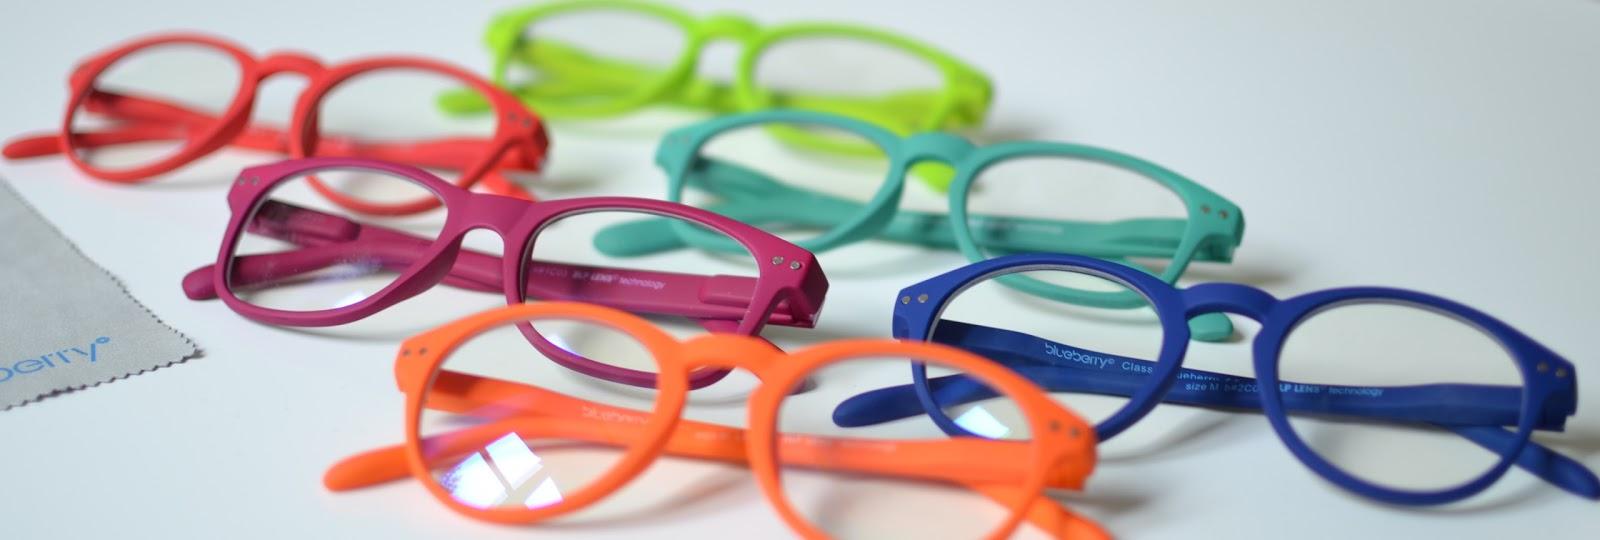 Lunettes-Blueberry, Blueberry, Blueberry-glasses, ophtalmo,  ophtalmologiste, santé- 896991a155e2